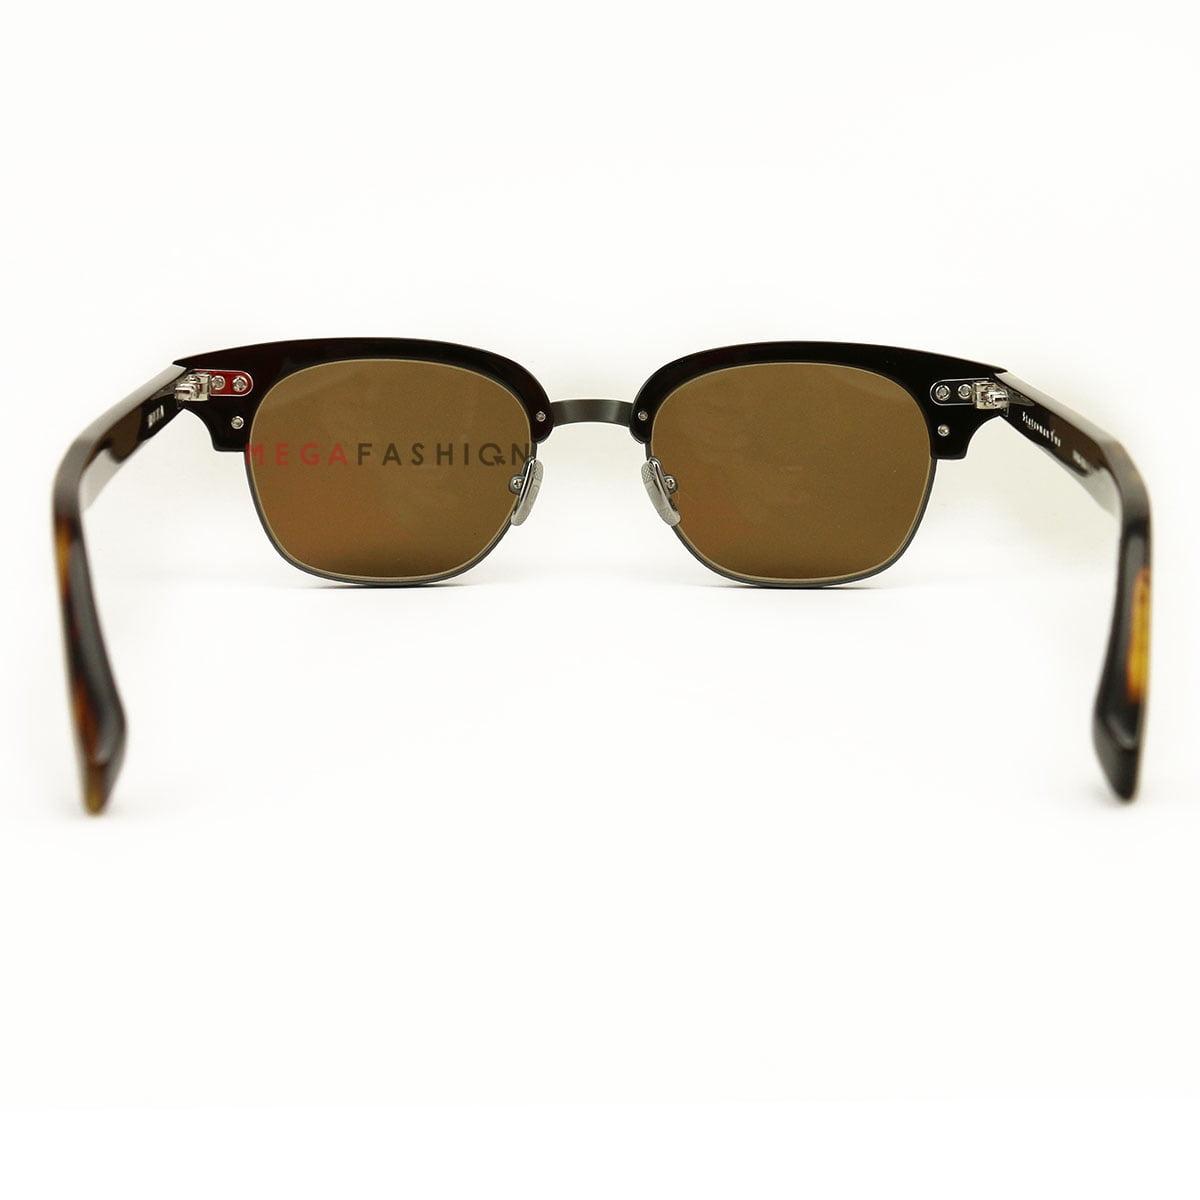 8917bf2119de Dita - Dita Oval Sunglasses DRX-2051 Statesman Two E-T-TRT-GUN Tortoise Gunmetal  DRX-2051 - Walmart.com